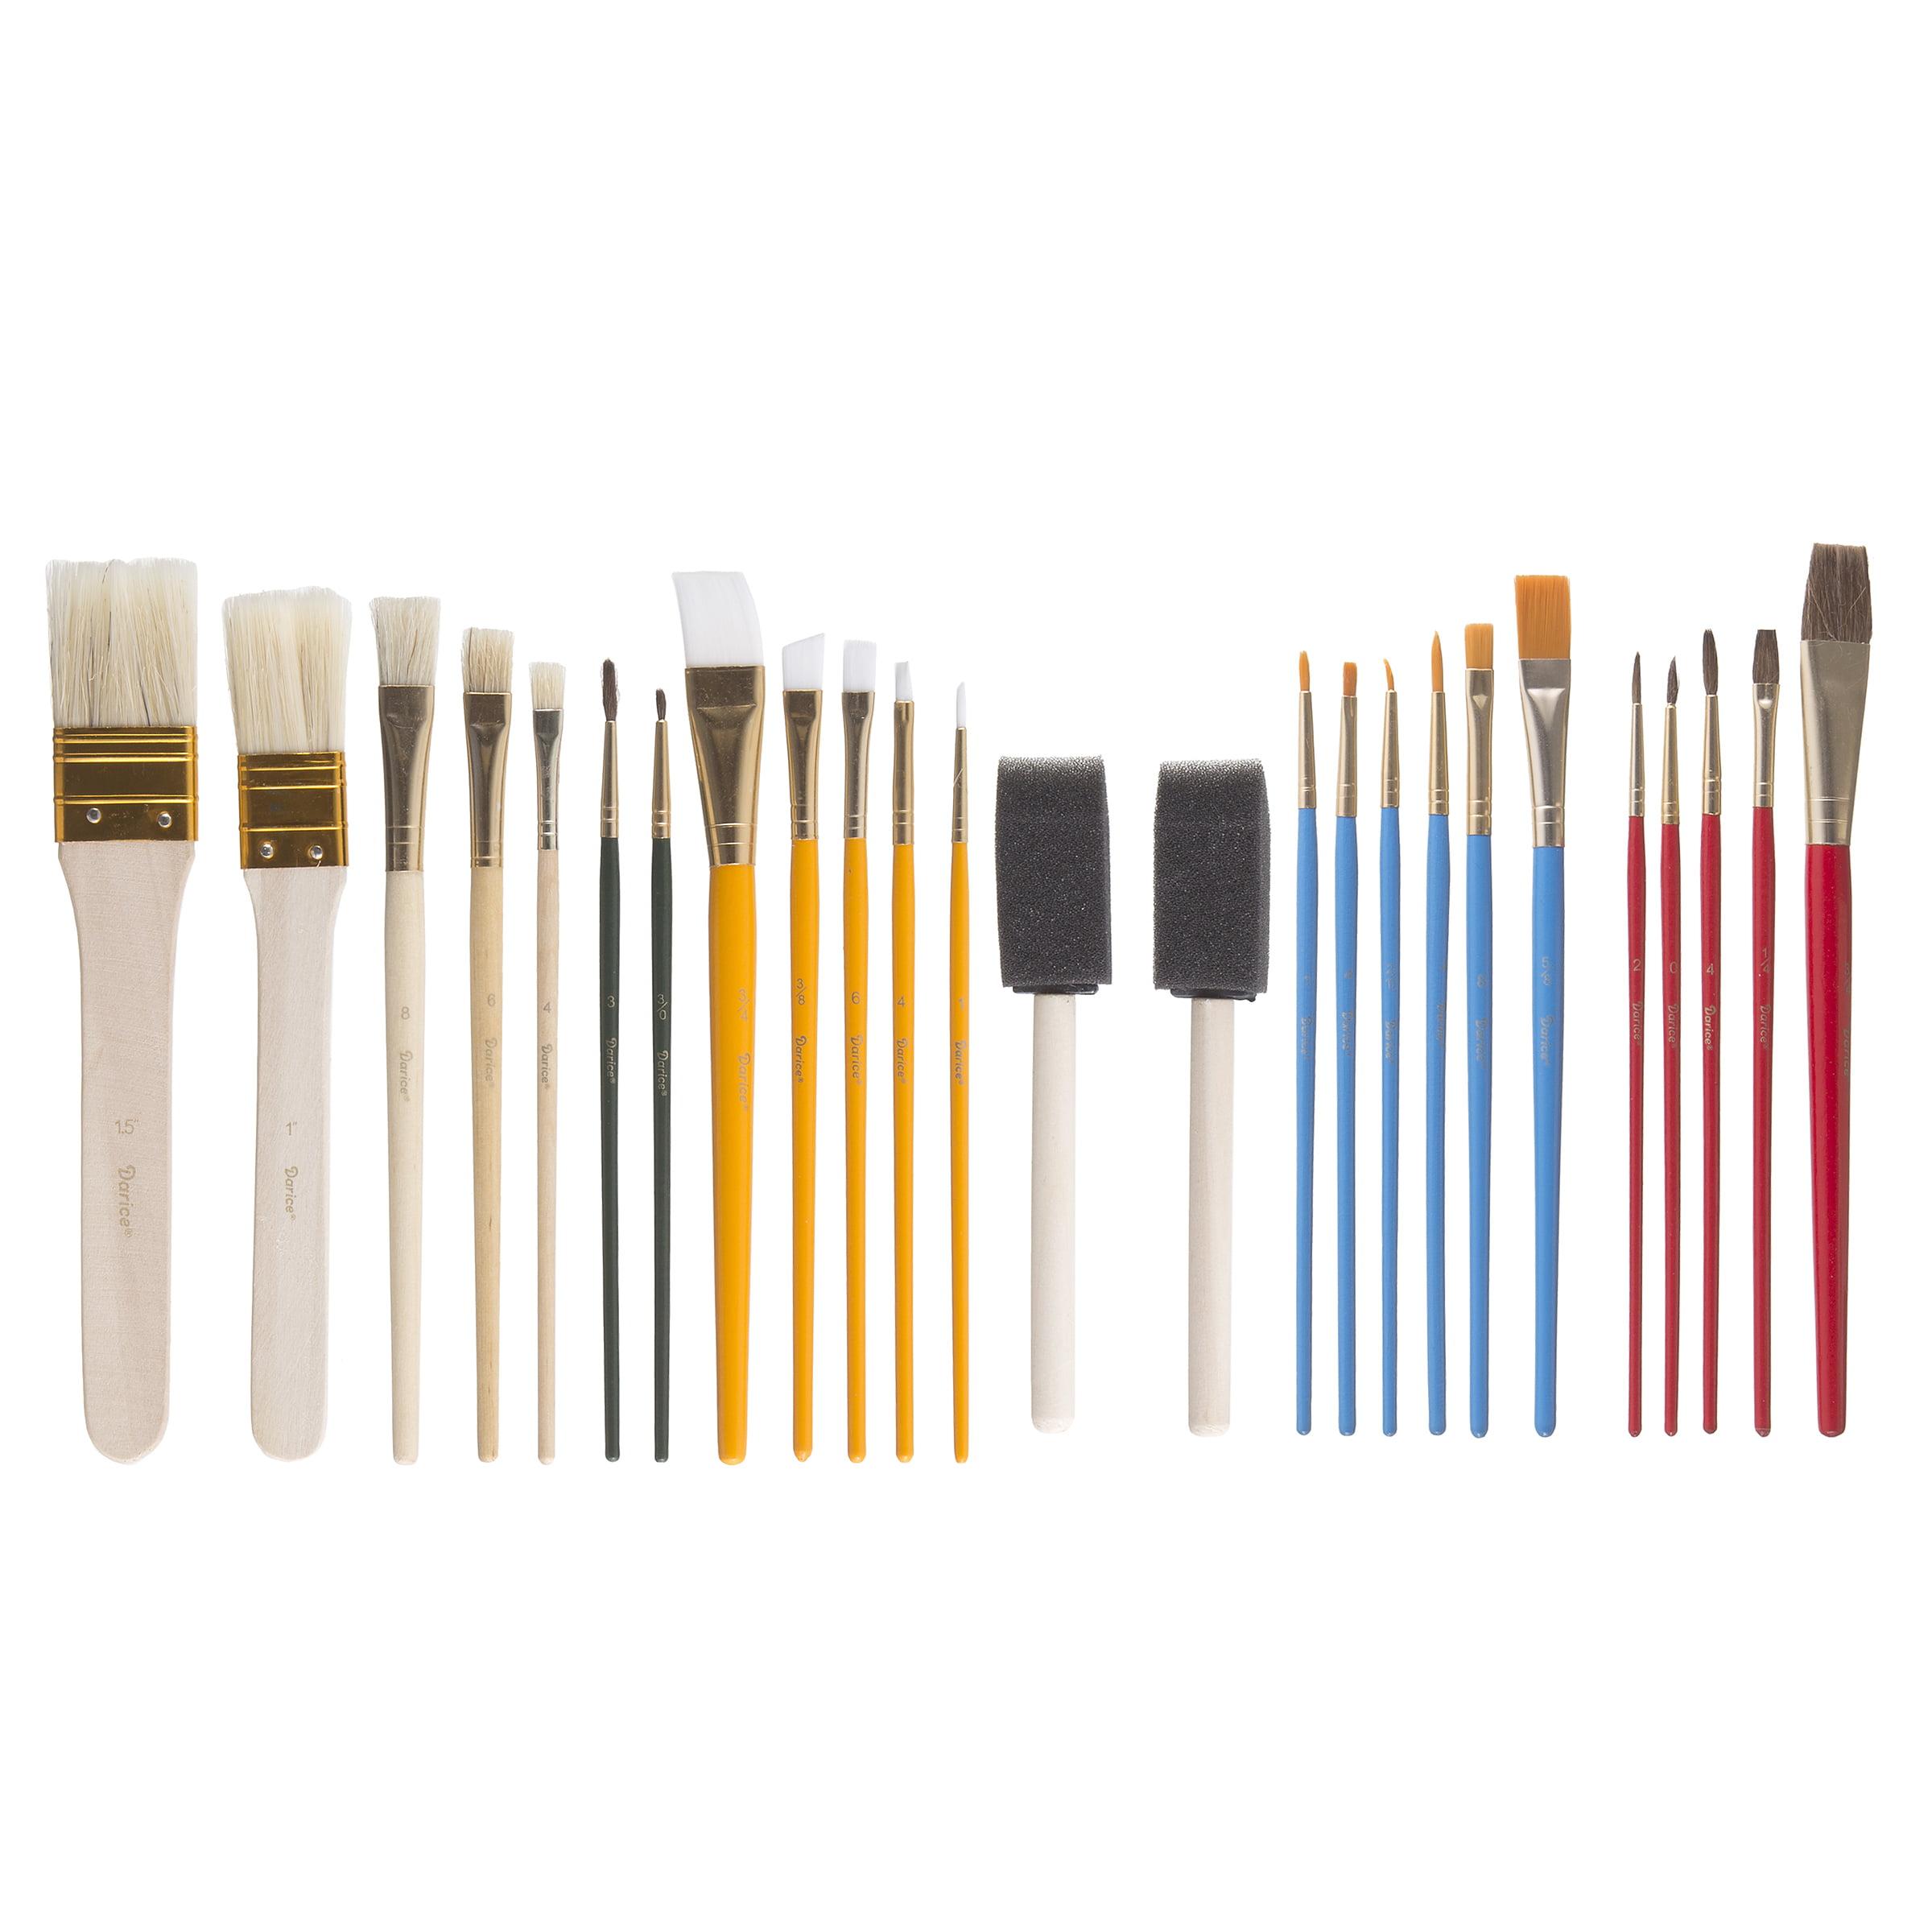 Paintbrush Set: Assorted, 25 pack